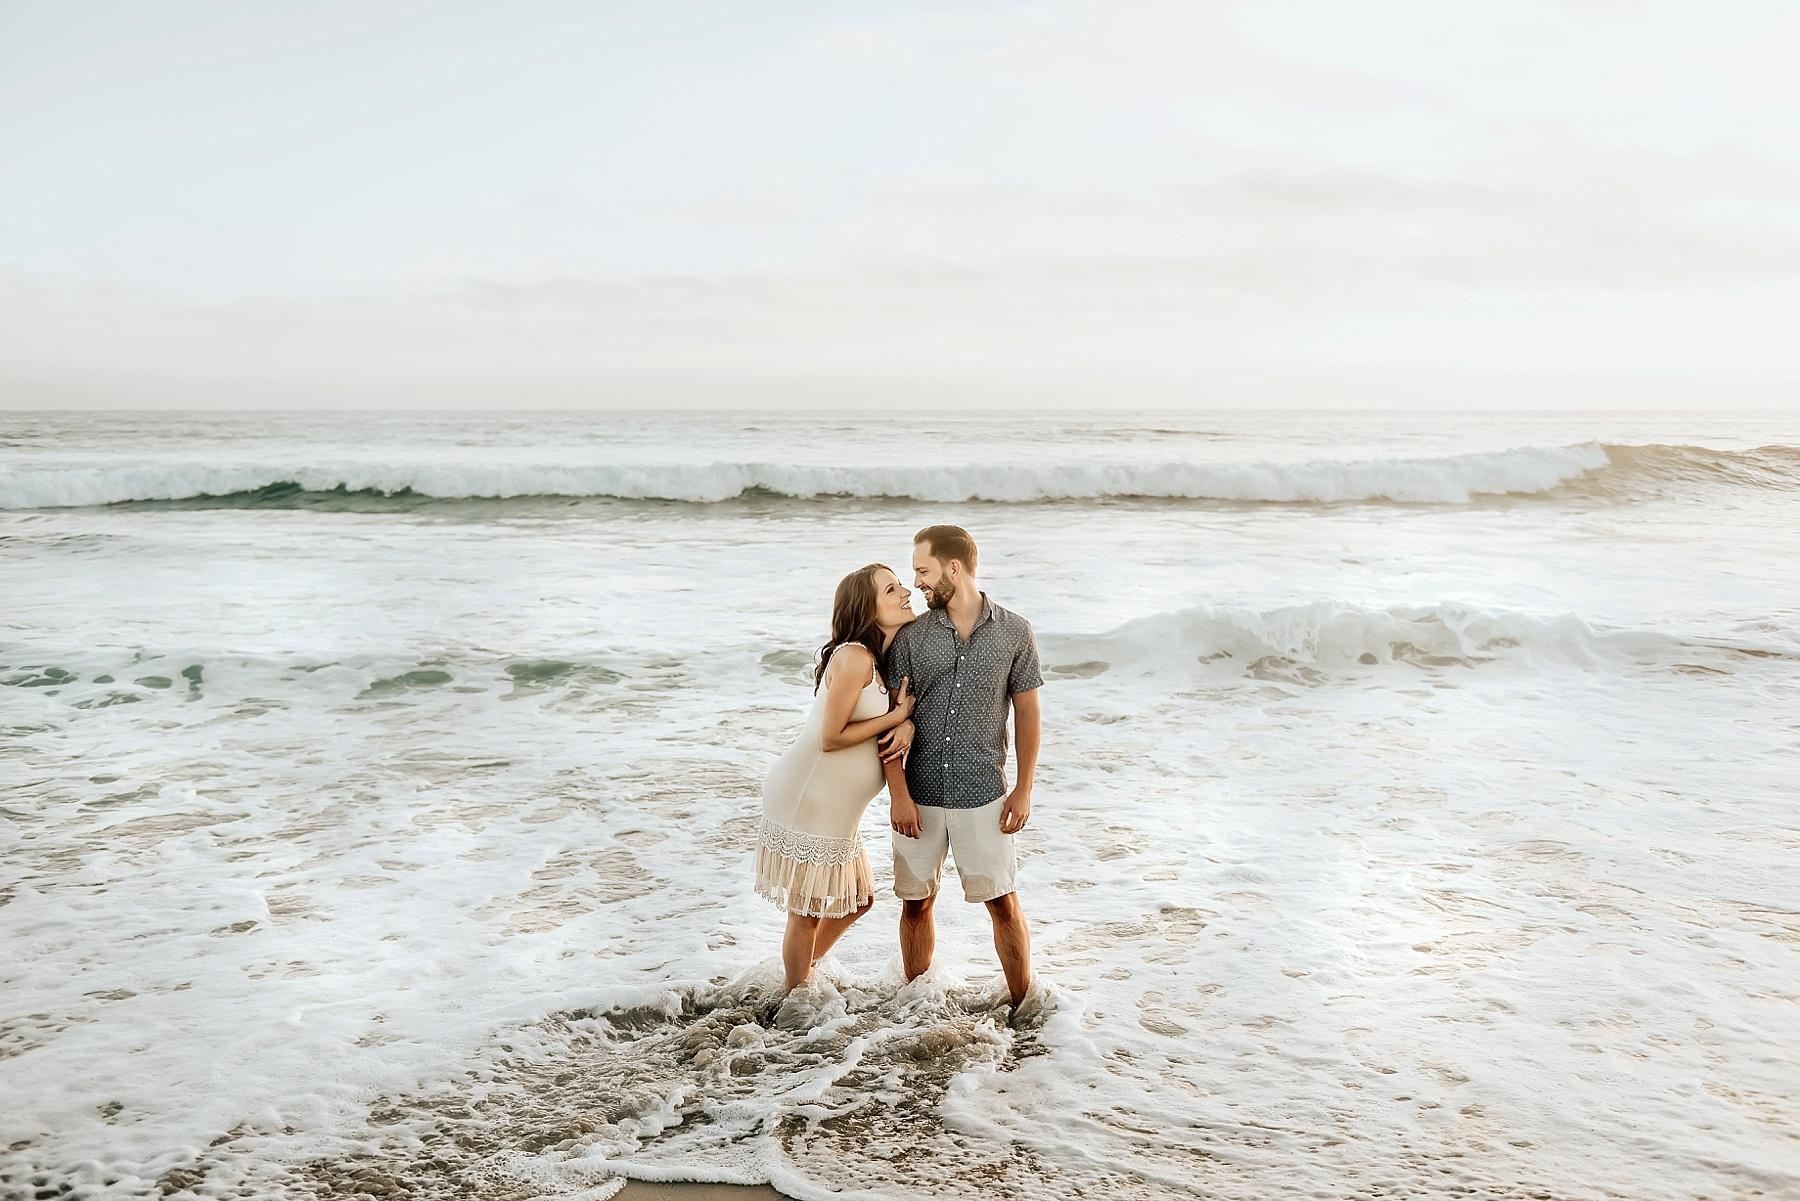 beach pregnancy photos couple in water